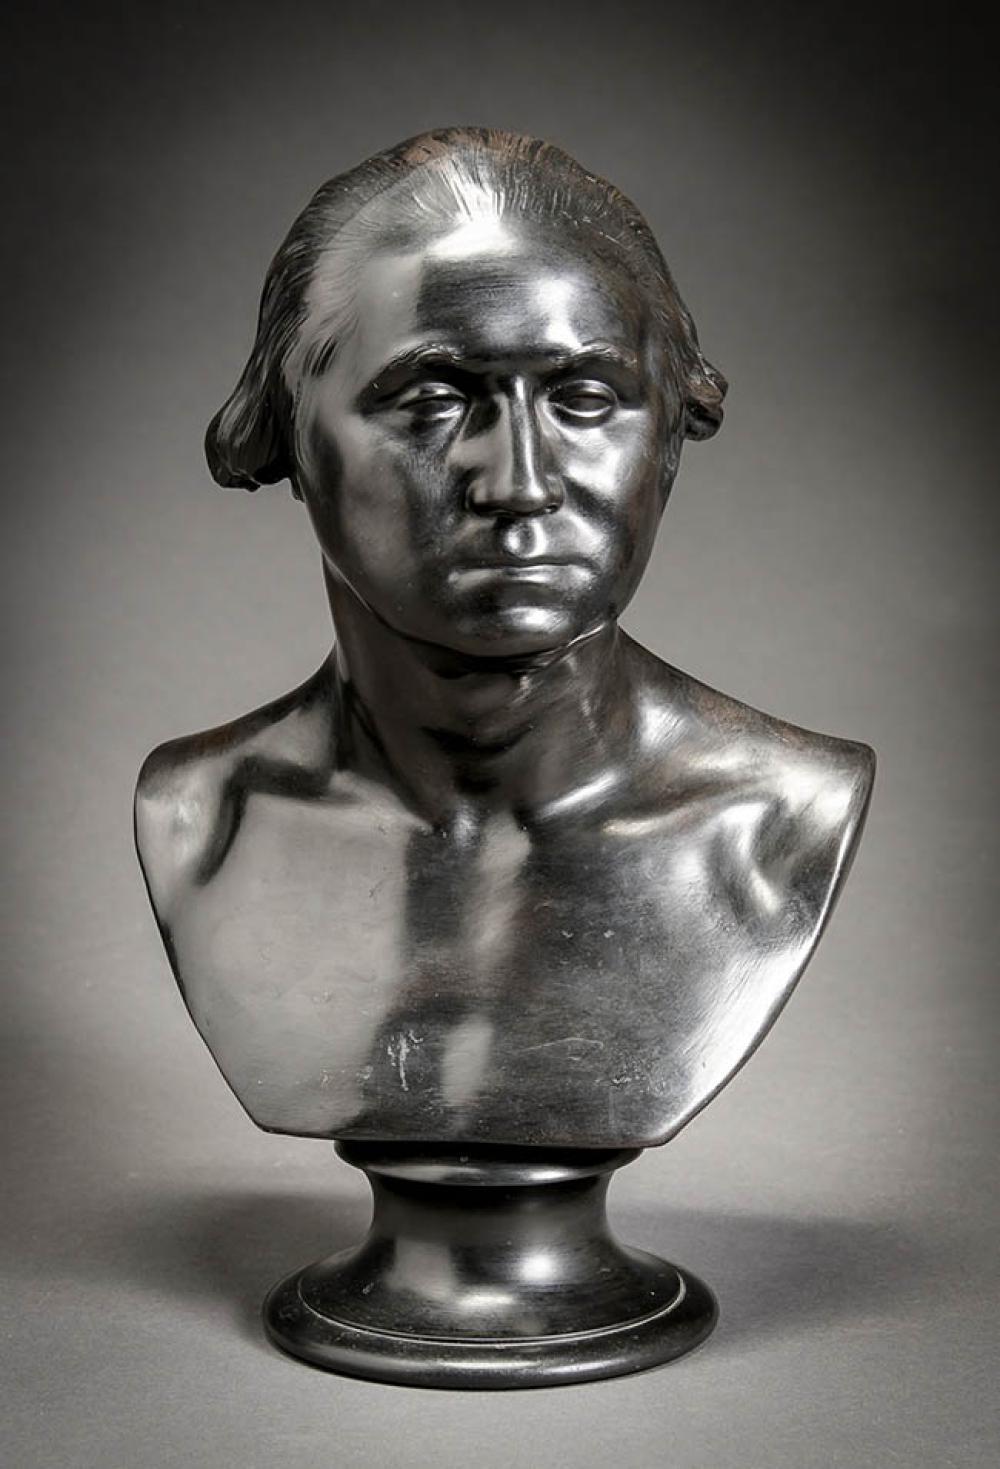 Wedgwood Black Basalt Bust of George Washington 19th Century, H: 13-3/4 in